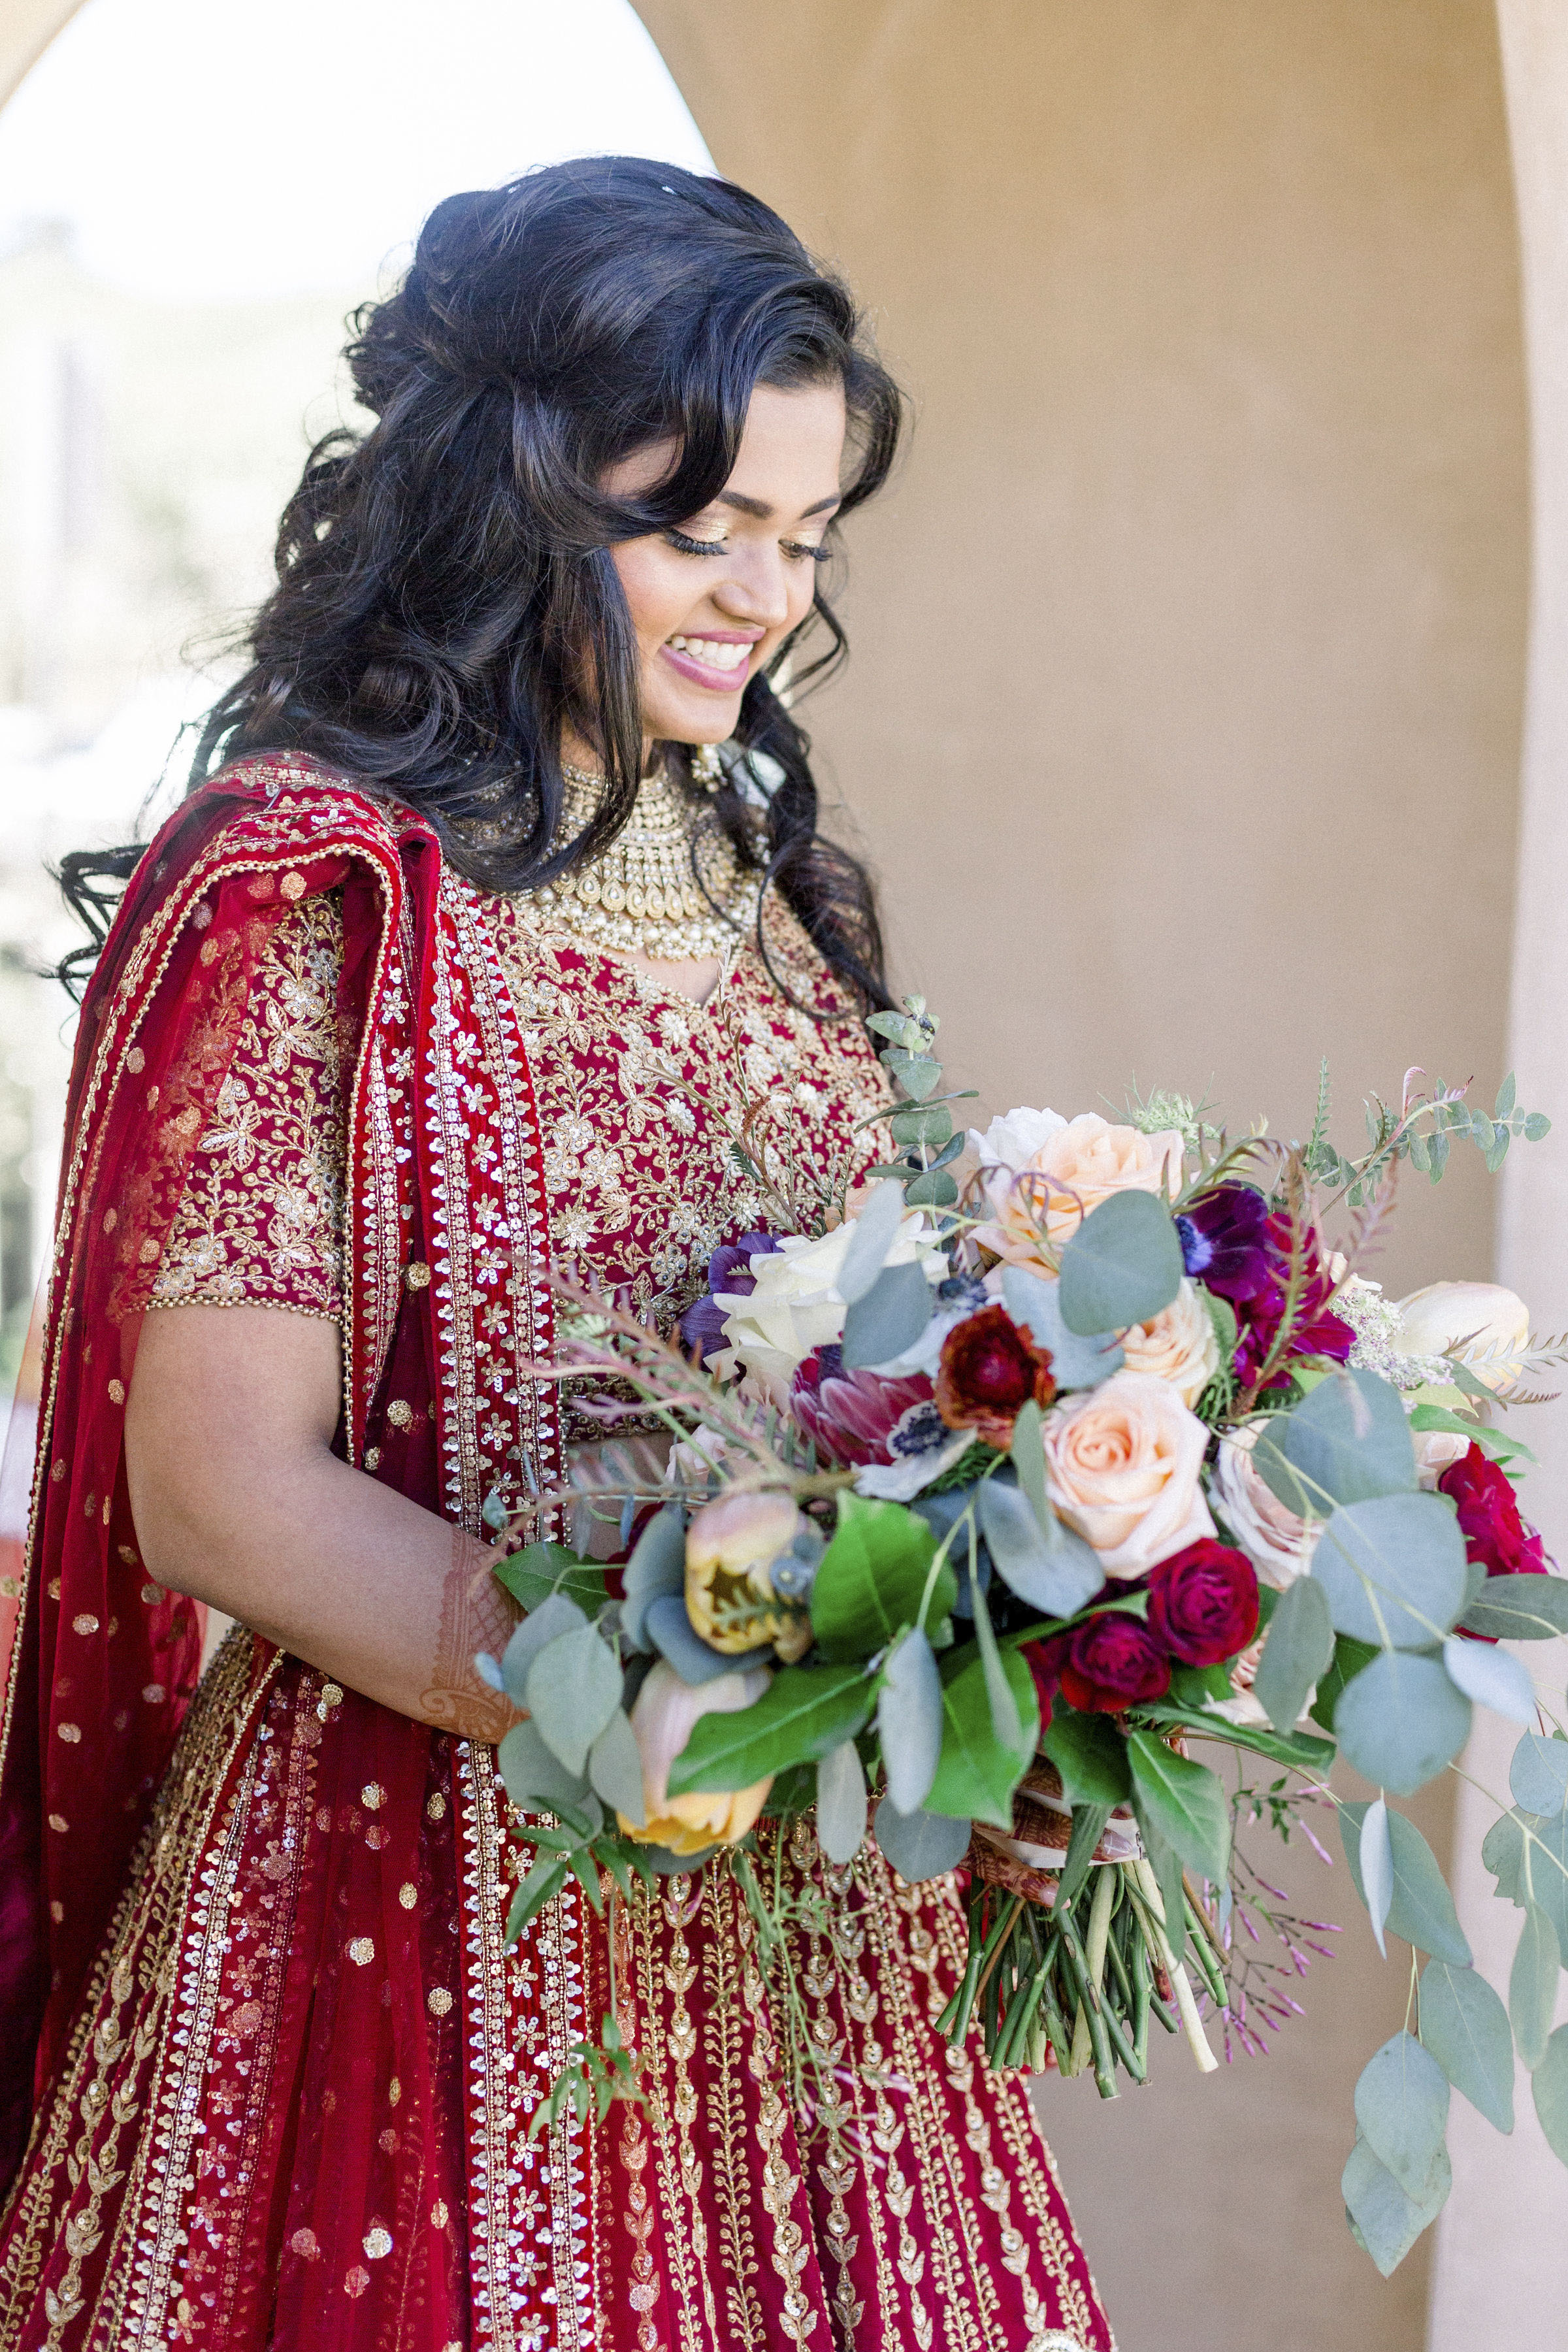 Domenica Beauty _ Hair and Makeup Artist _Wedding _ Temecula, CA _ Pratishtha and Christopher _ 14.JPG